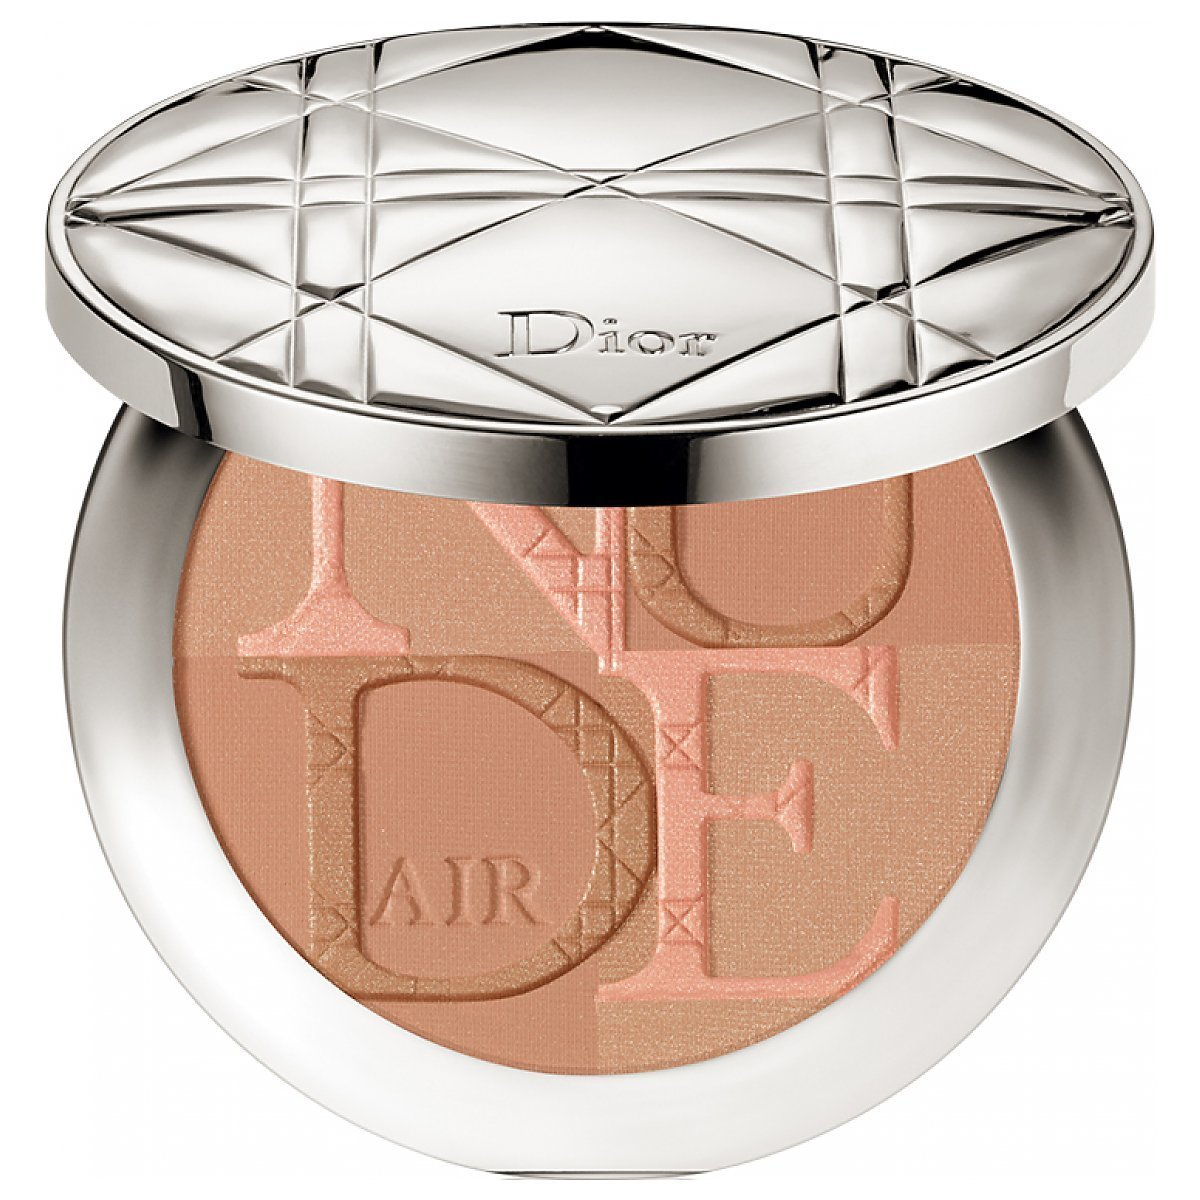 Dior Diorskin Nude Natural Glow Fresh Powder Makeup SPF